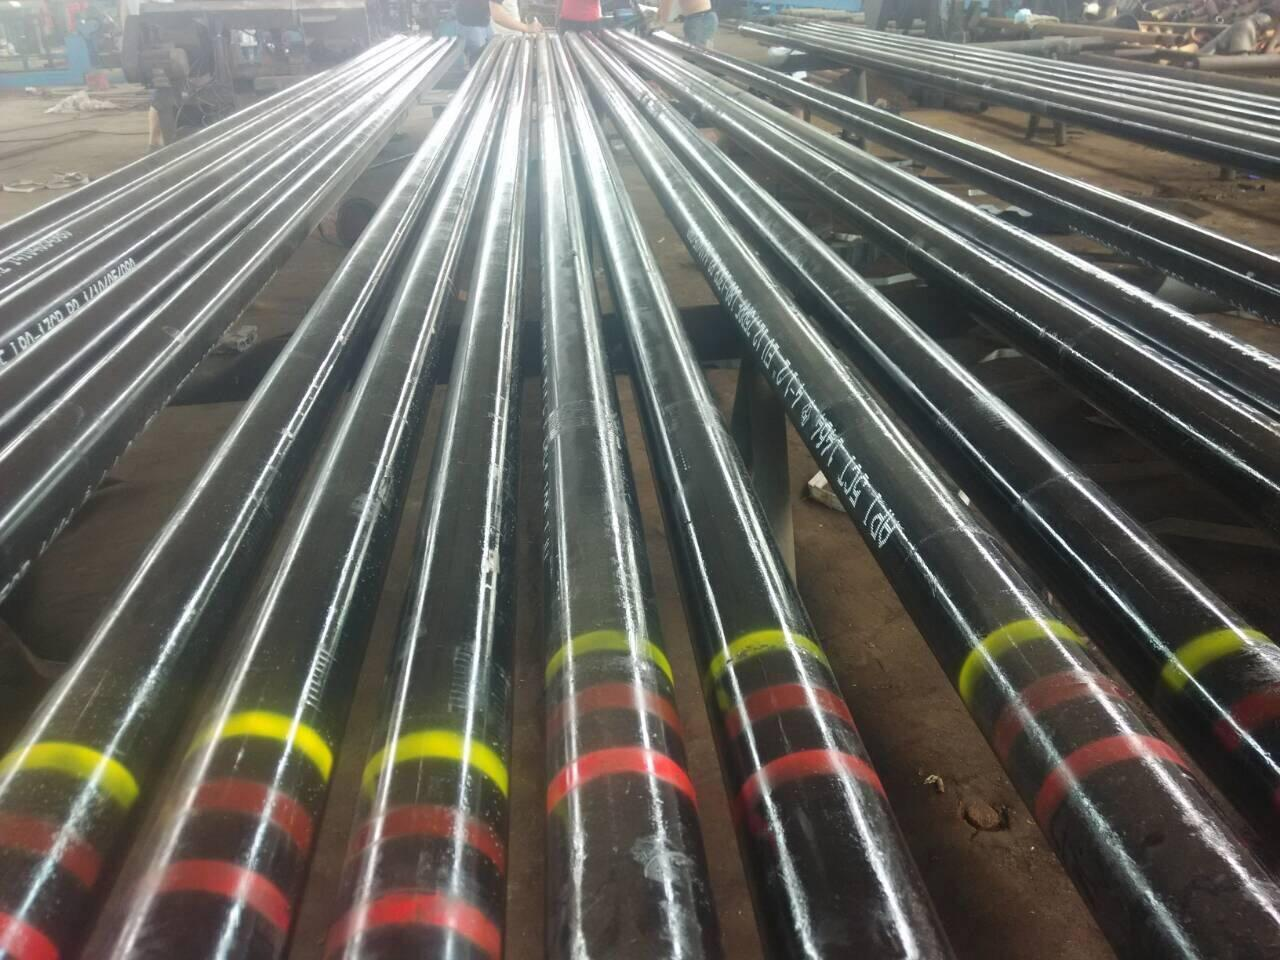 Derbo Exported 700 Pieces API 5CT K55 4.7LB EUE R2 Tubing to Australia